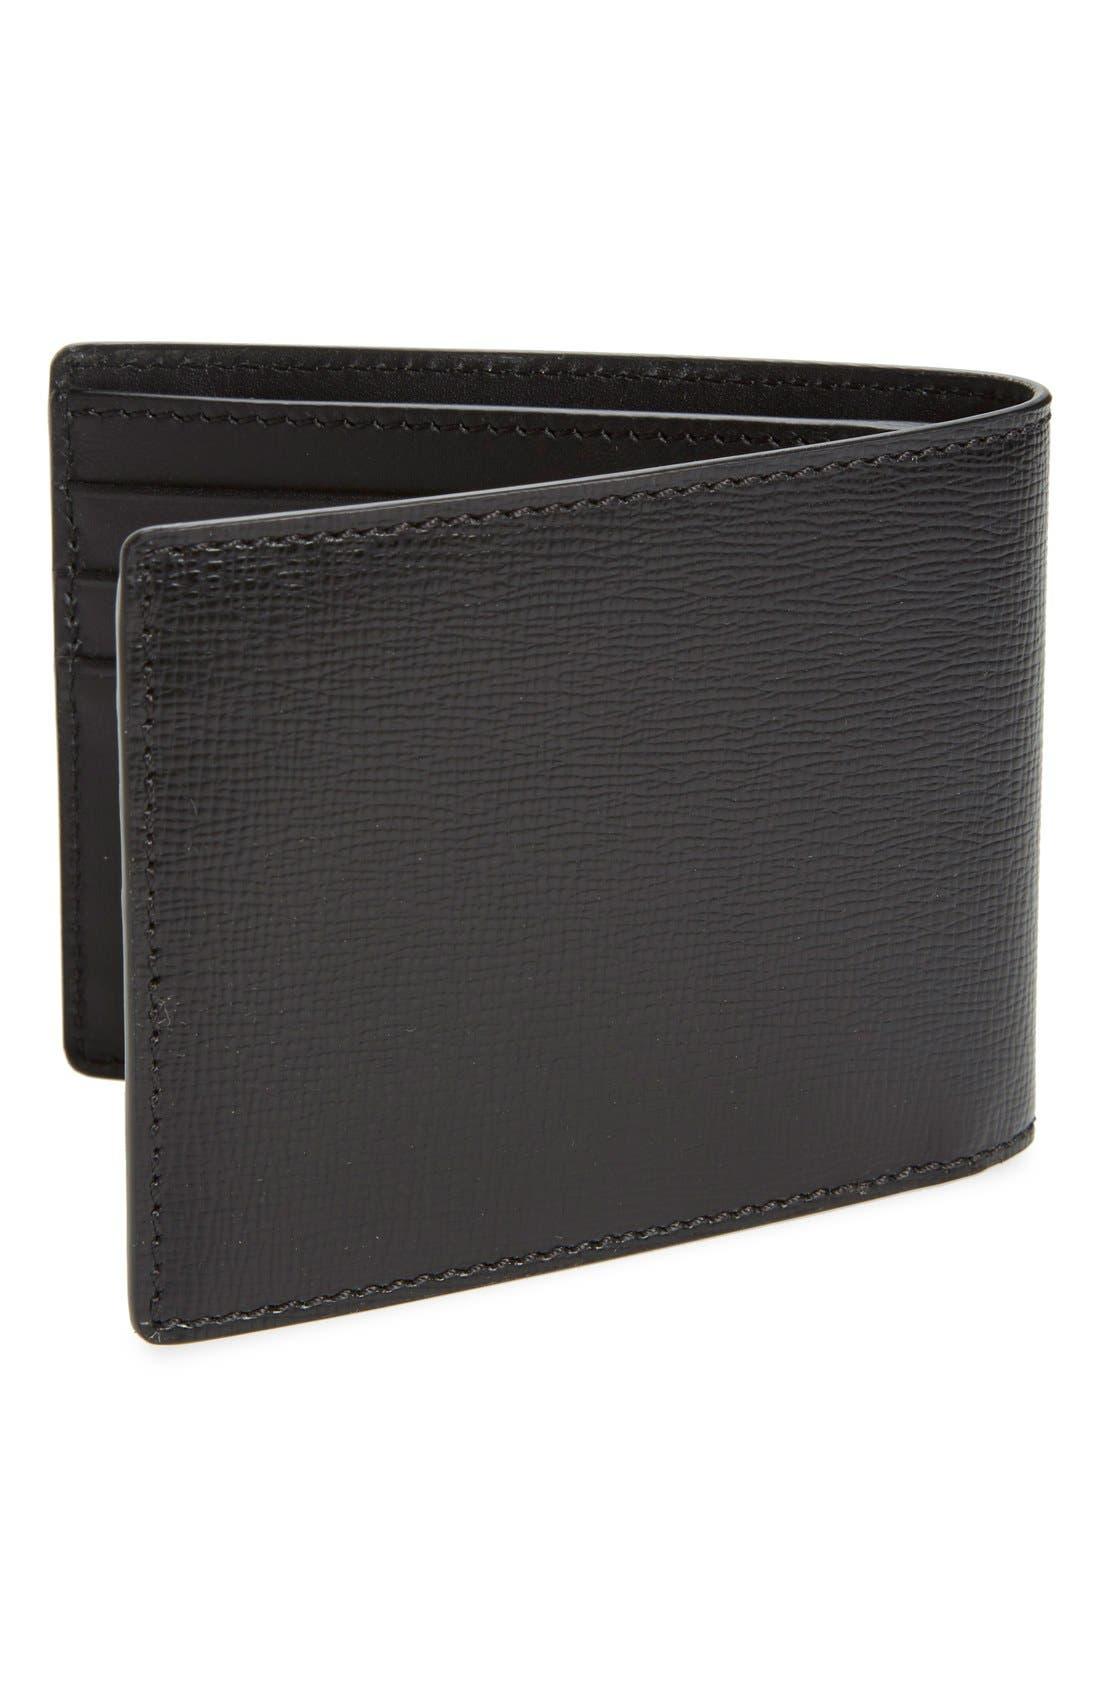 Alternate Image 3  - Burberry 'New London' Calfskin Leather Bifold Wallet